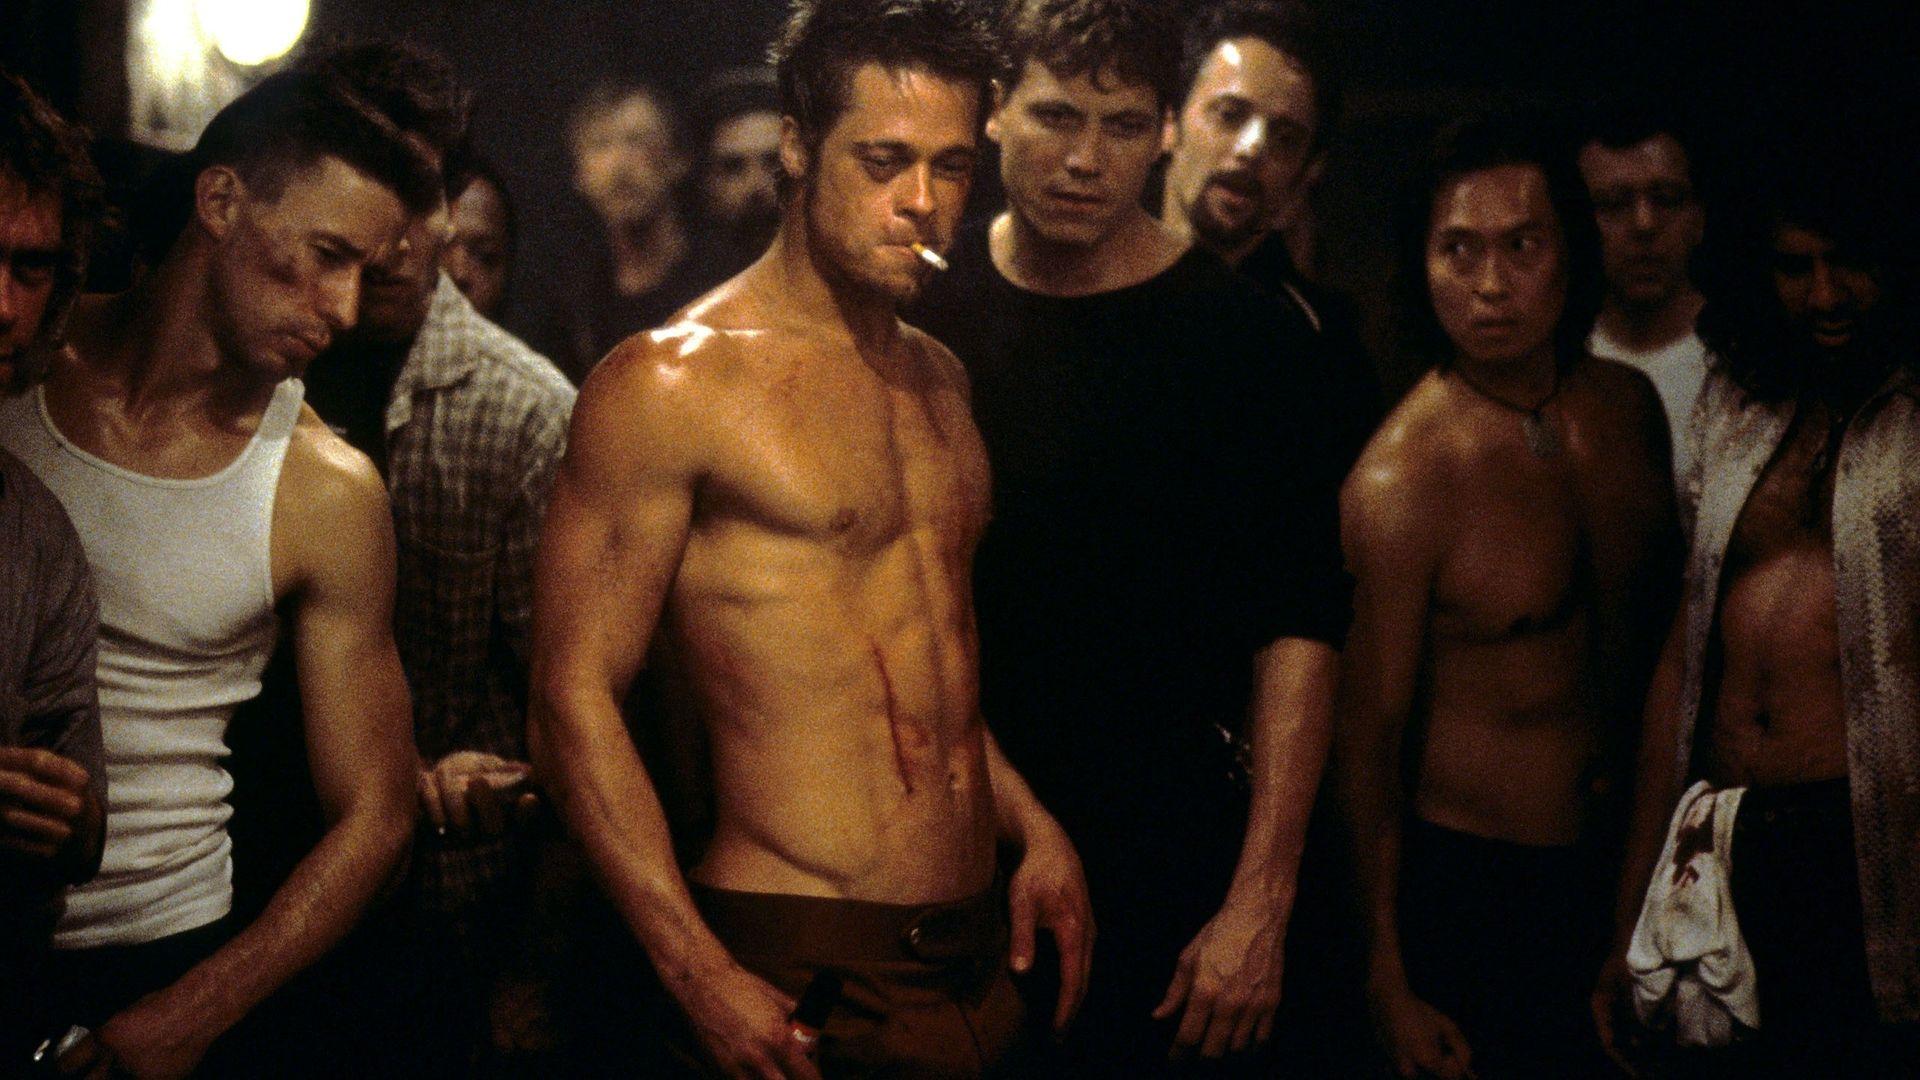 Brad Pitt stars in Fight Club. - Credit: Contributed